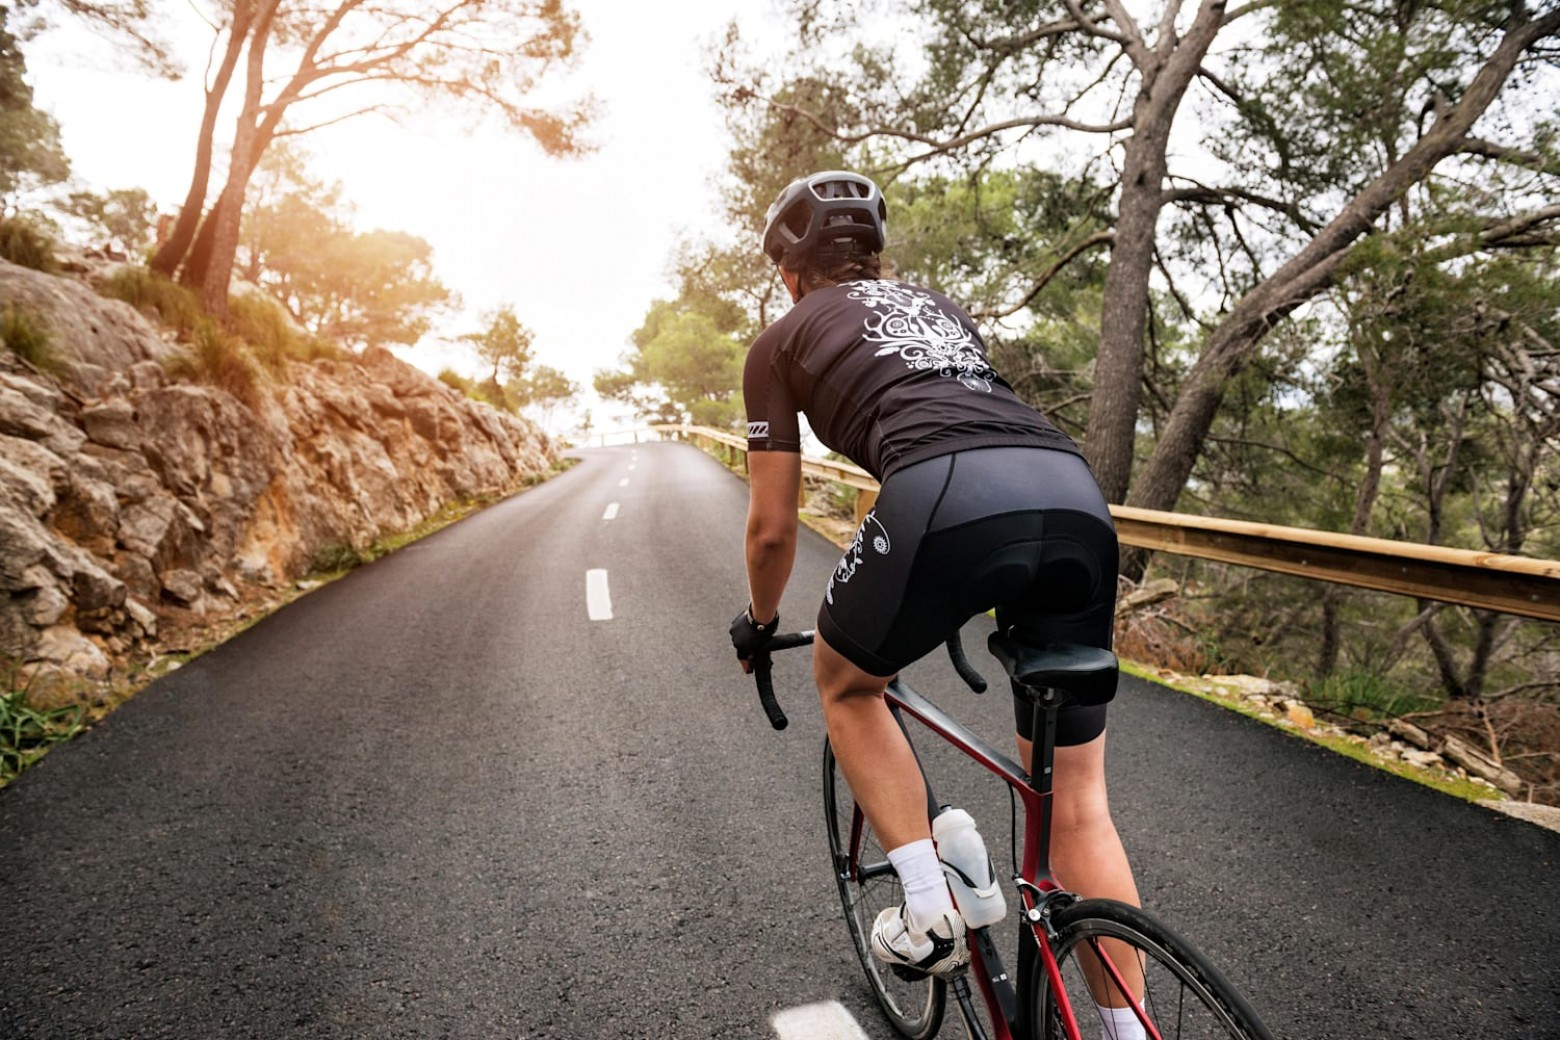 salidas-cortas-largas-bicicleta/